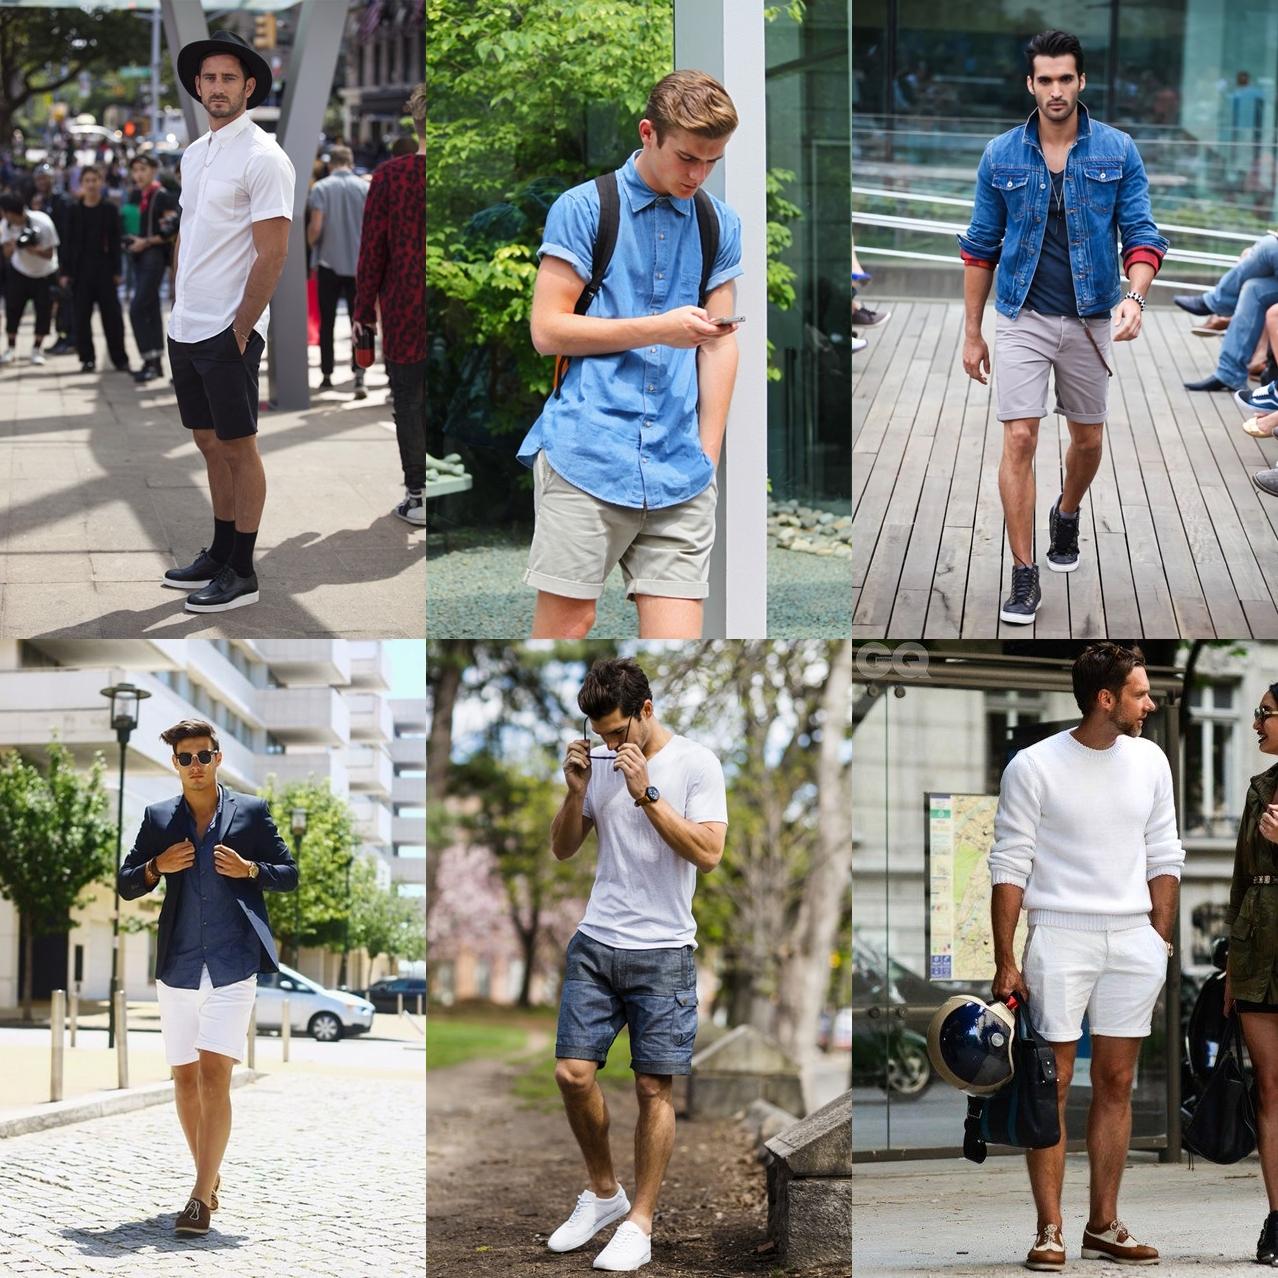 como usar short masculino, short masculino 2016, verão 2016, tendencia masculina, moda masculina, dicas de moda, dicas de estilo, alex cursino, moda sem censura, menswear, blogger, blogueiro de moda,